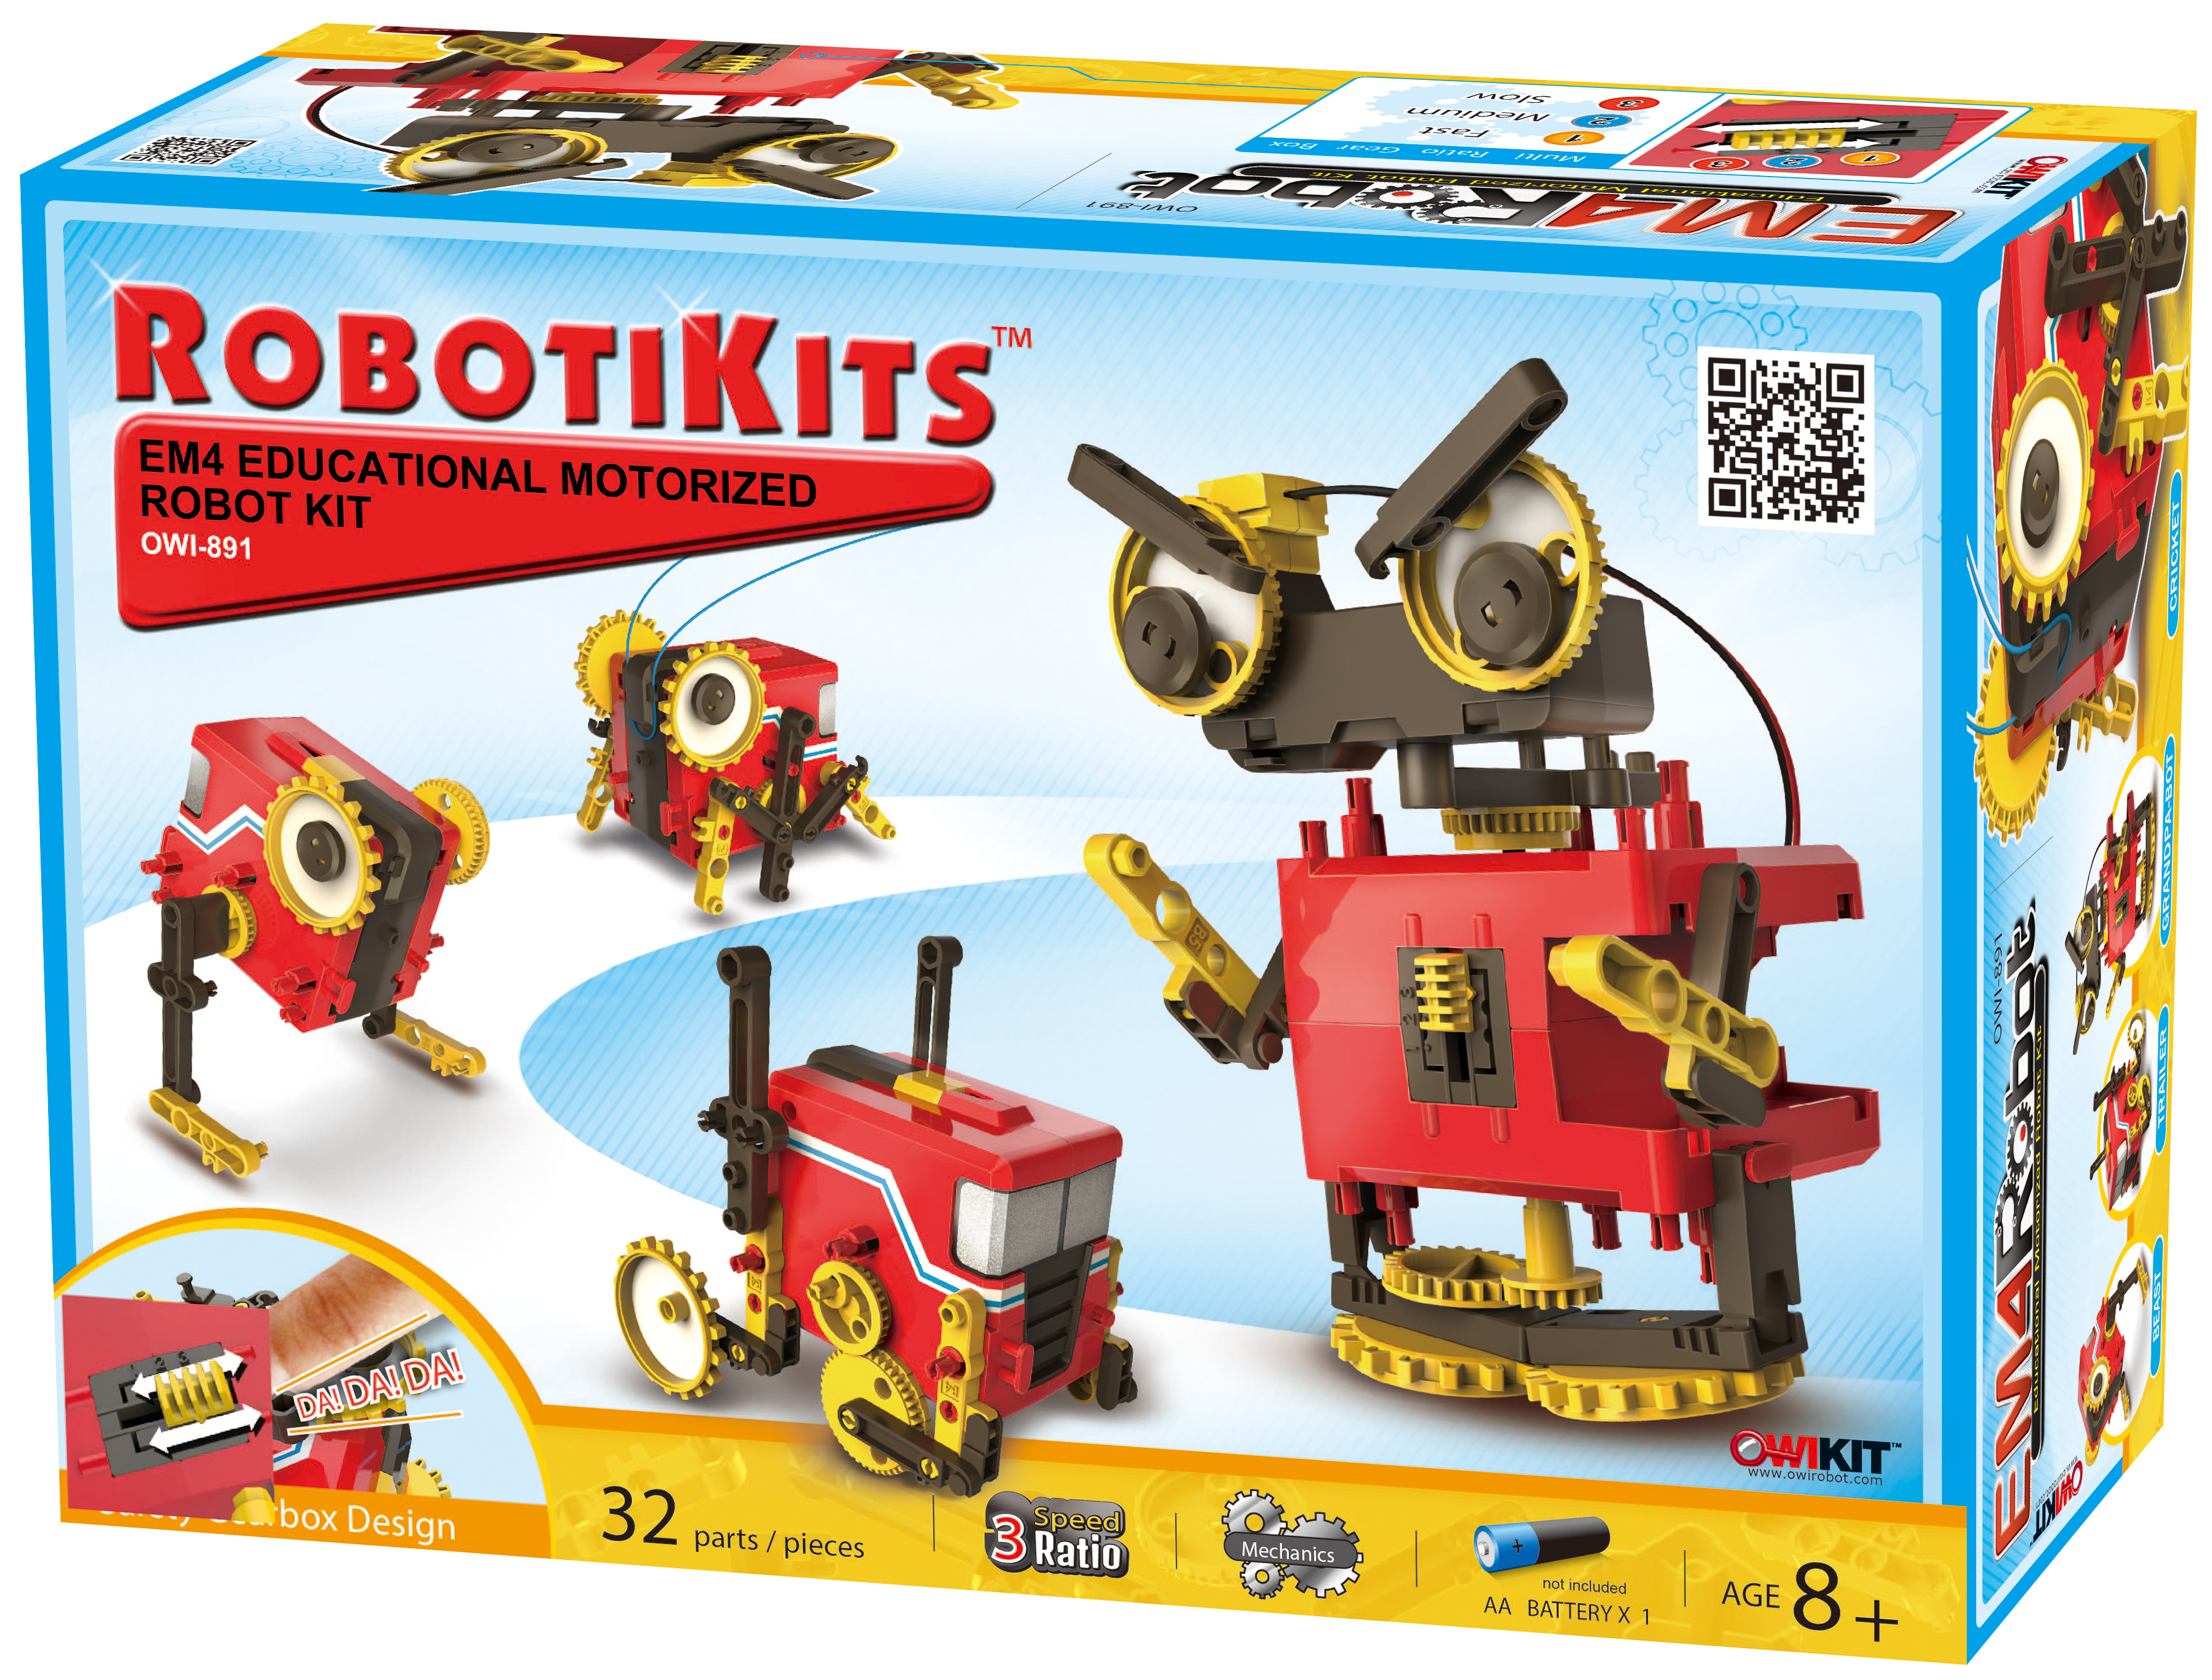 Educational Toys & Kits Archives Elenco